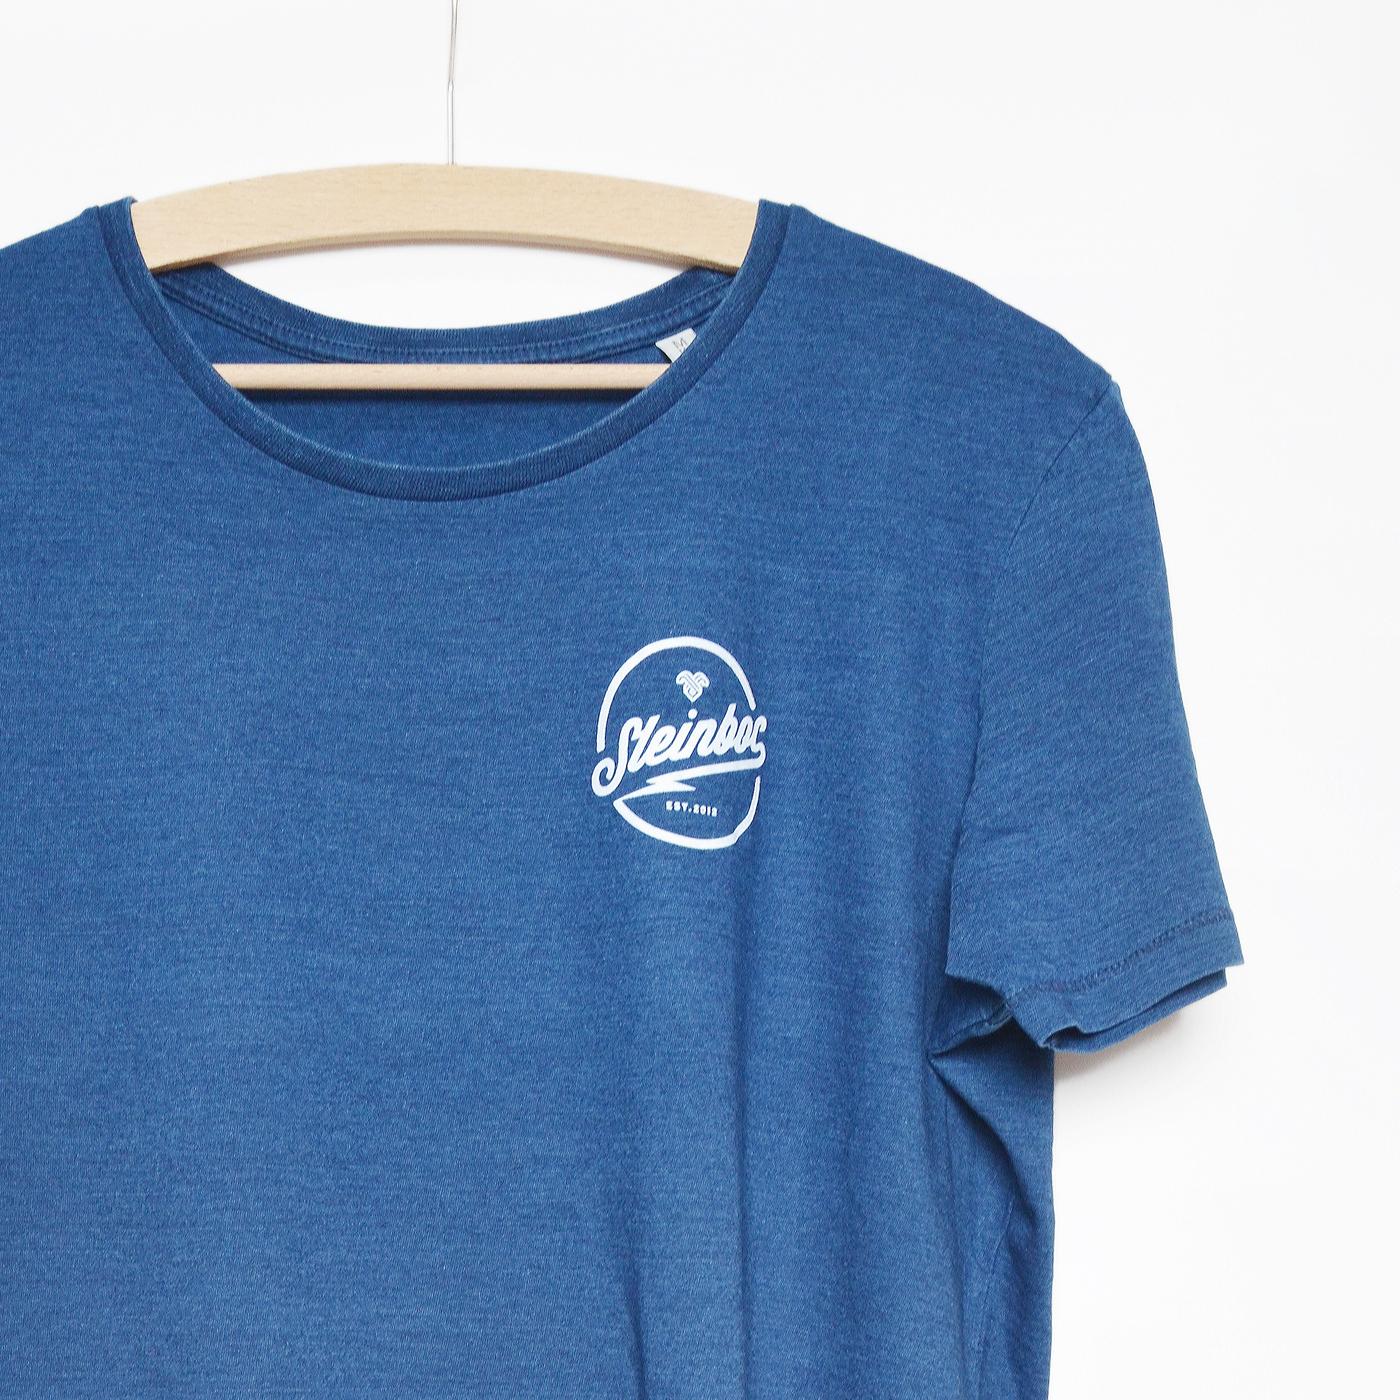 Jersey-Shirt-Steinboc_detail_quadrat_hp